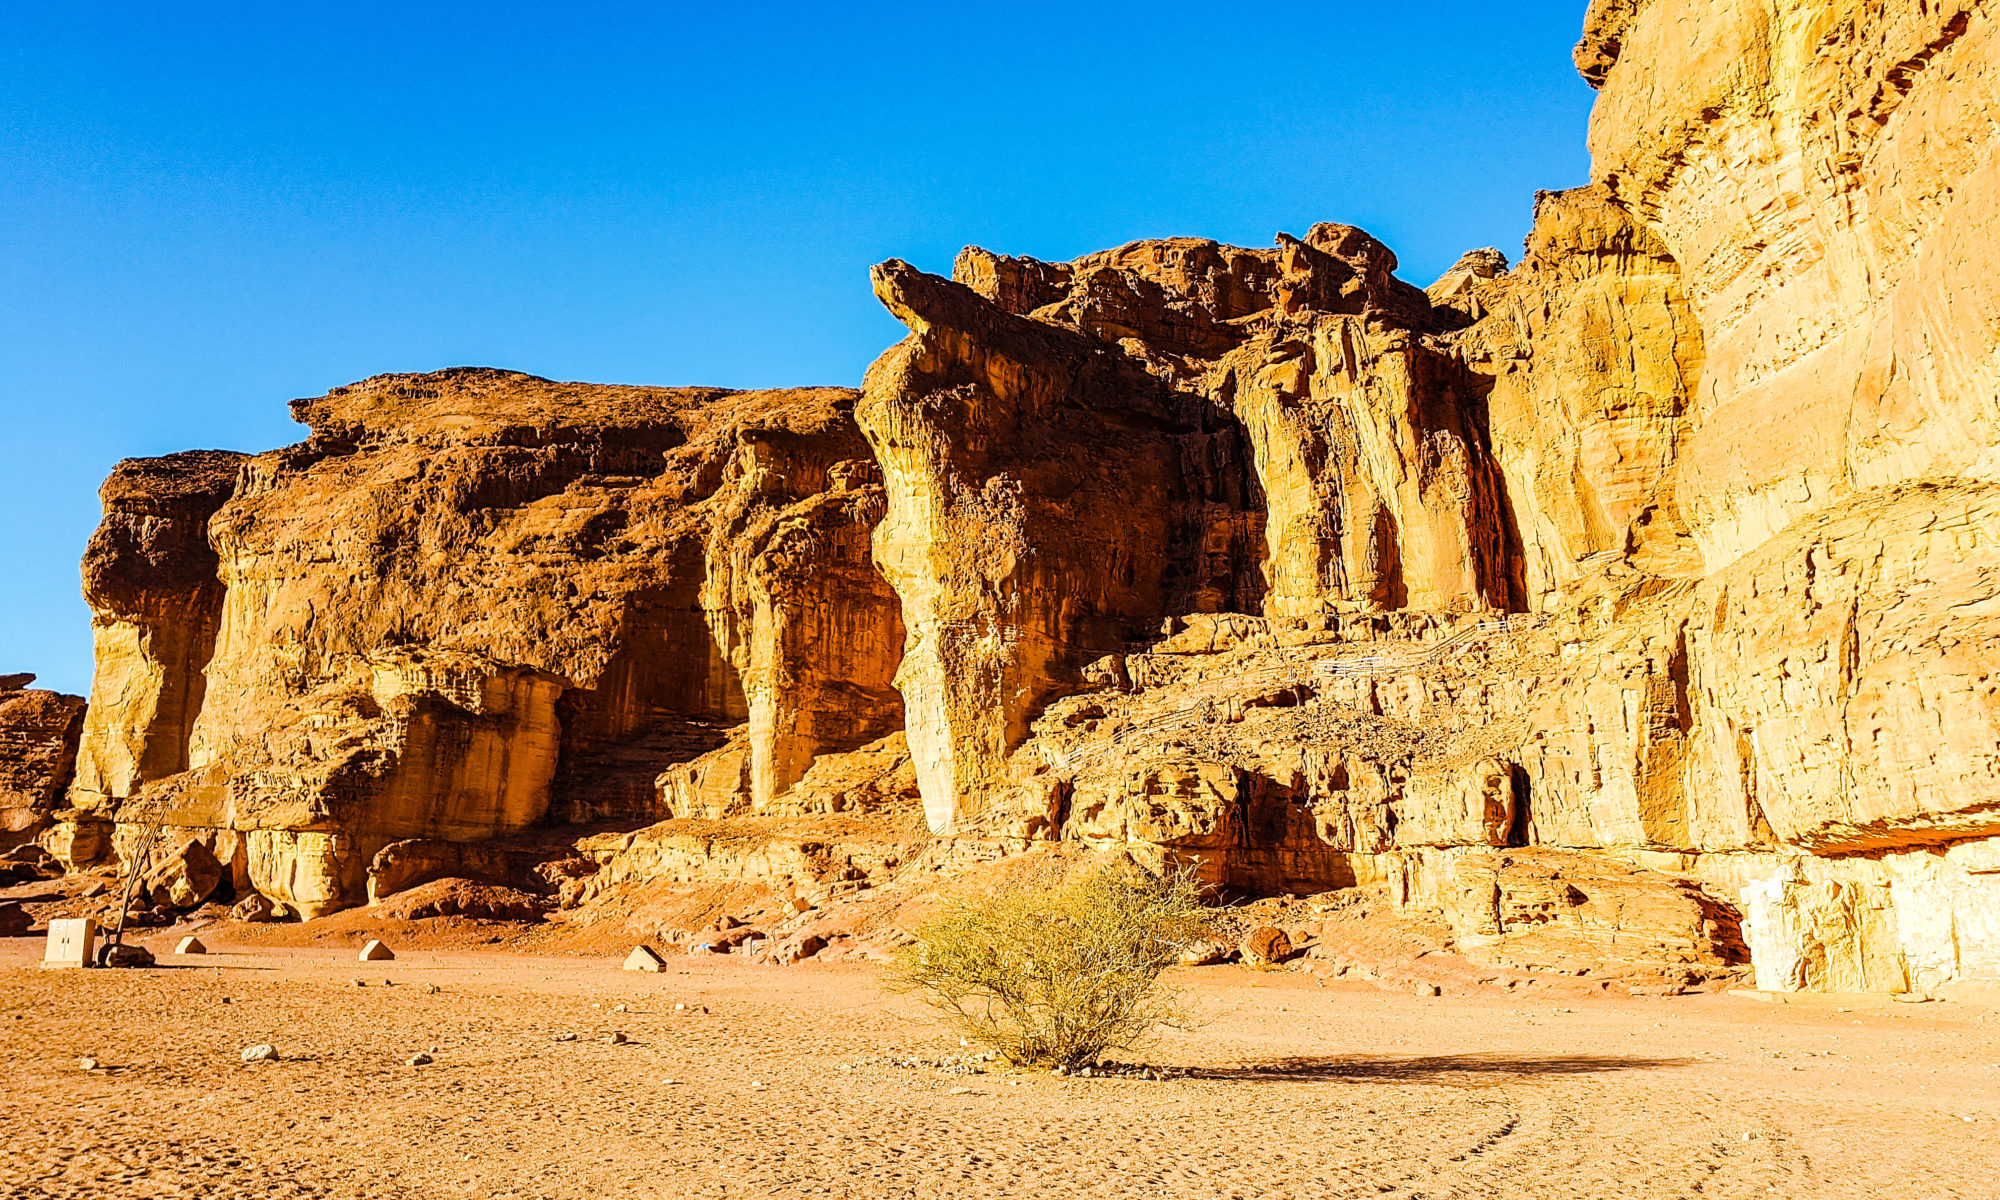 Israel Tumna Sandsteinformationen